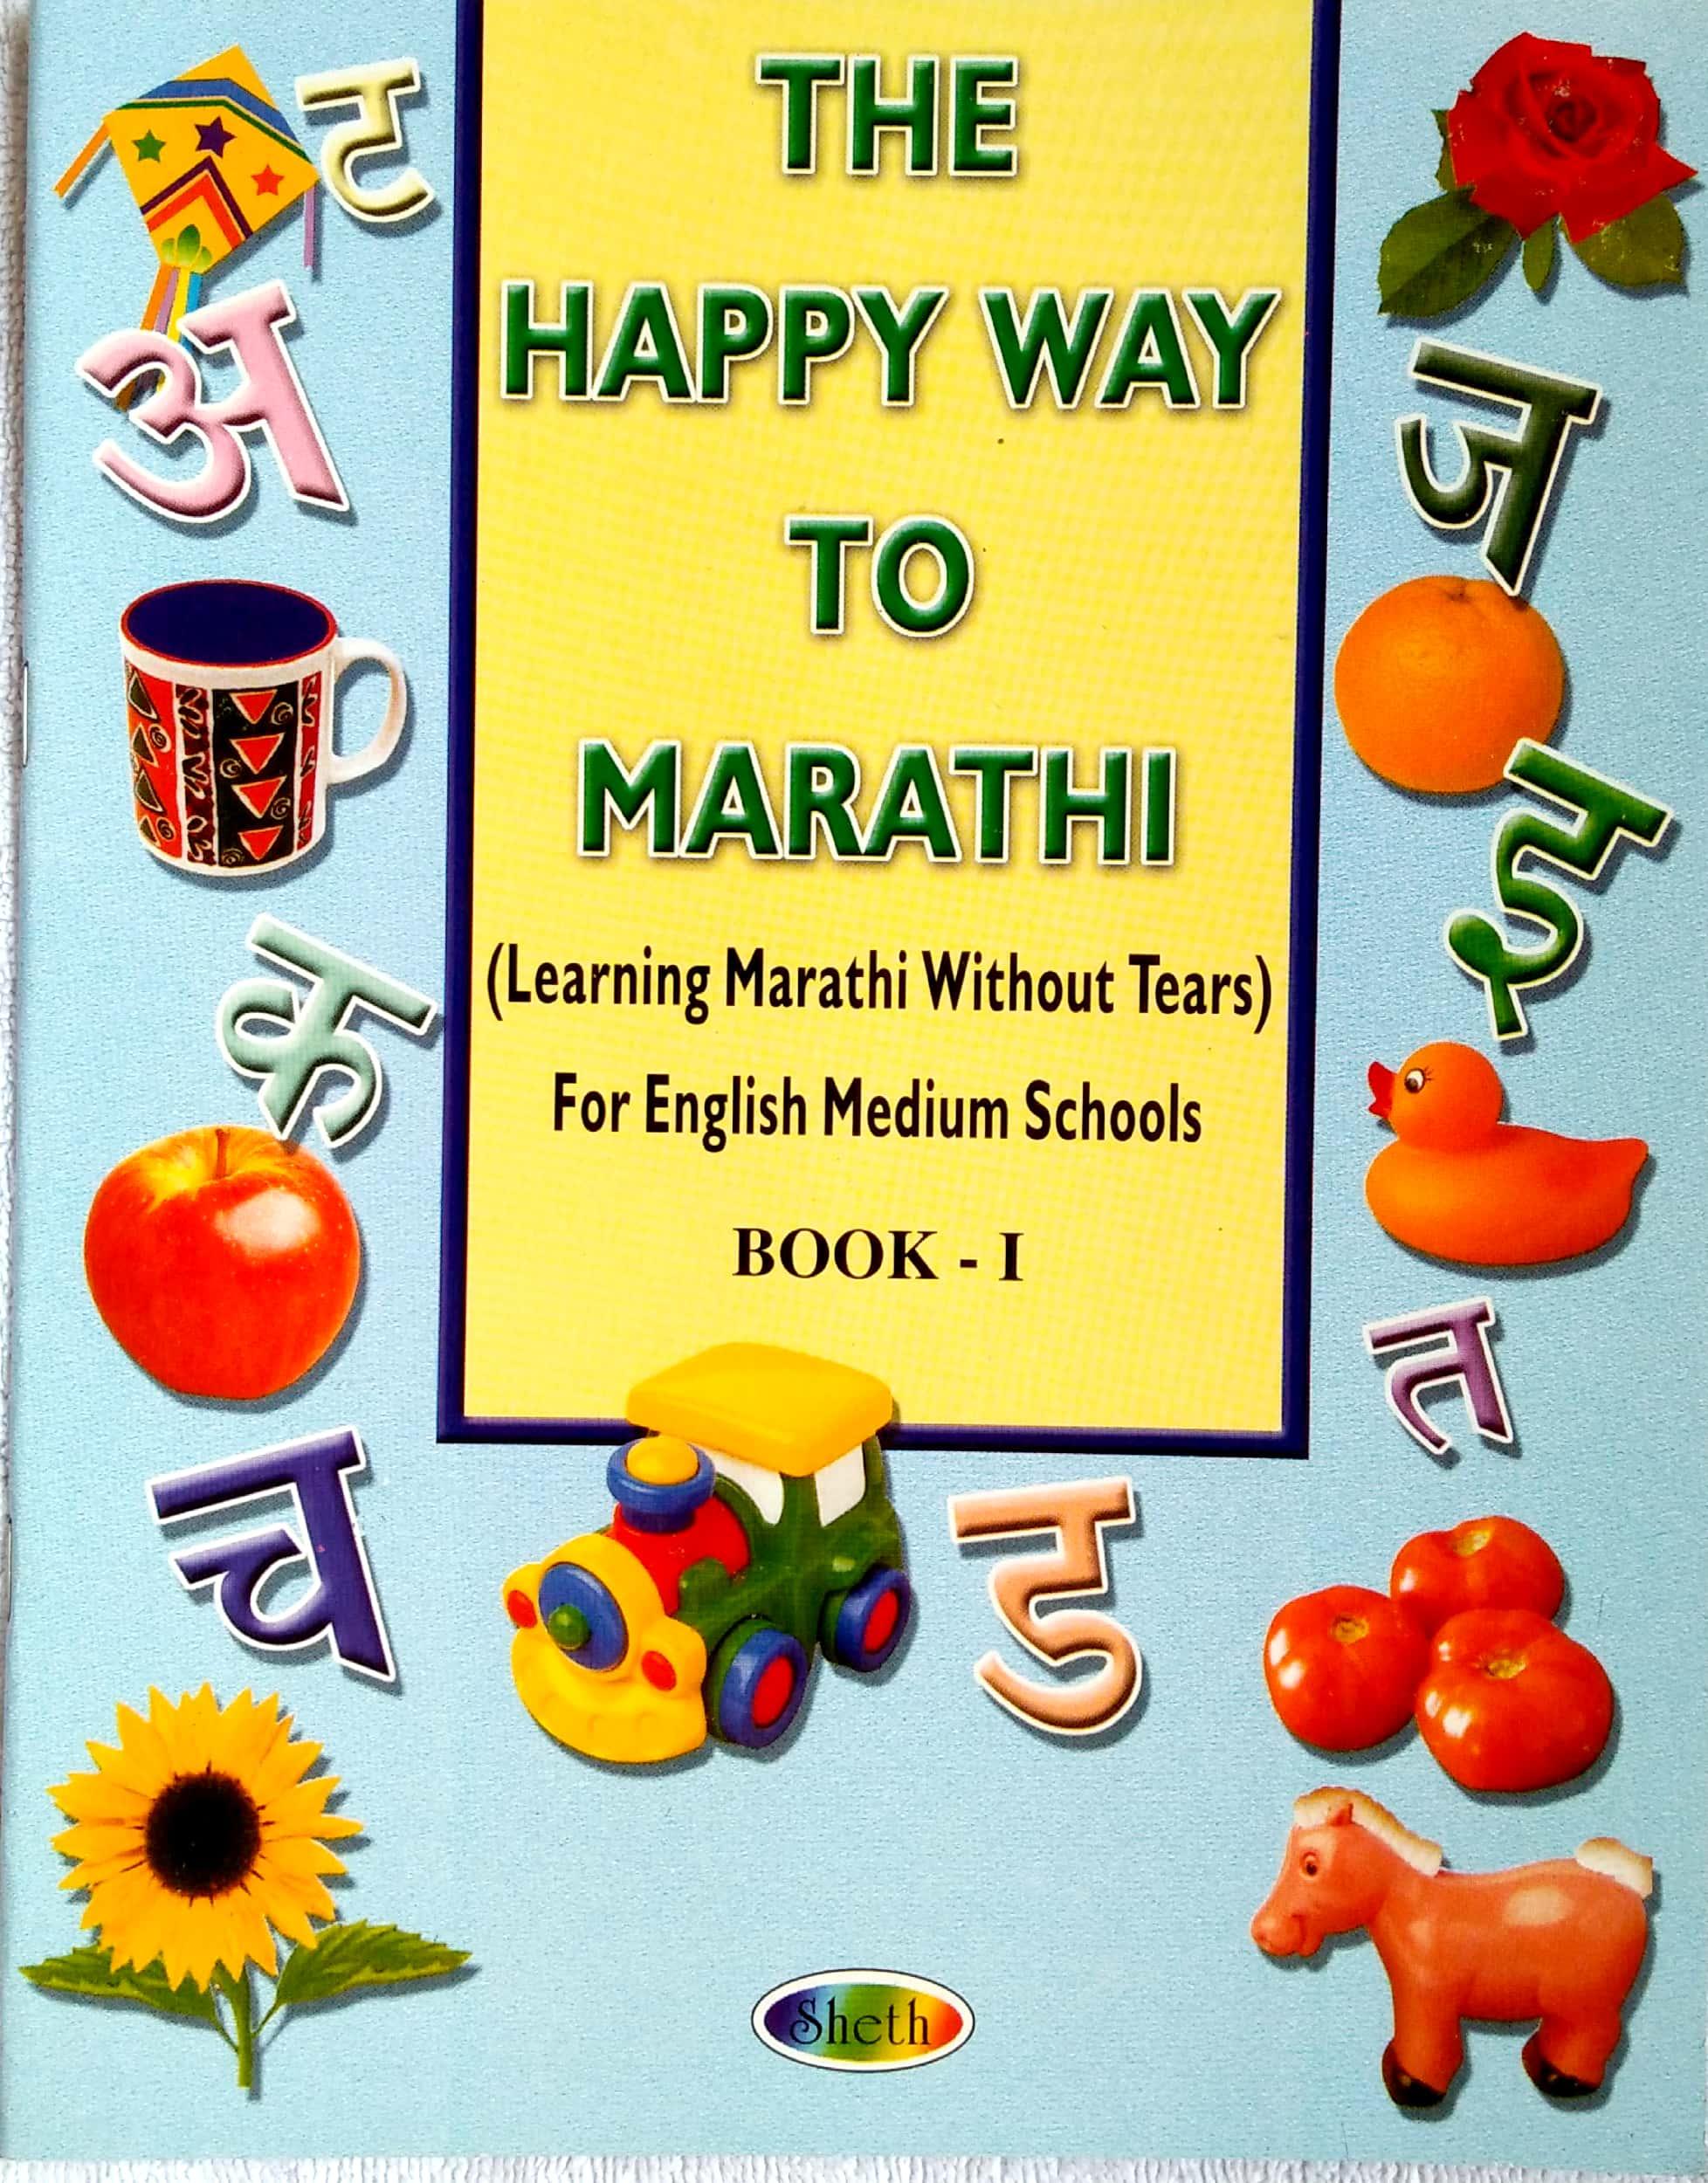 The Happy Way To Marathi For English Medium Schools Book 1